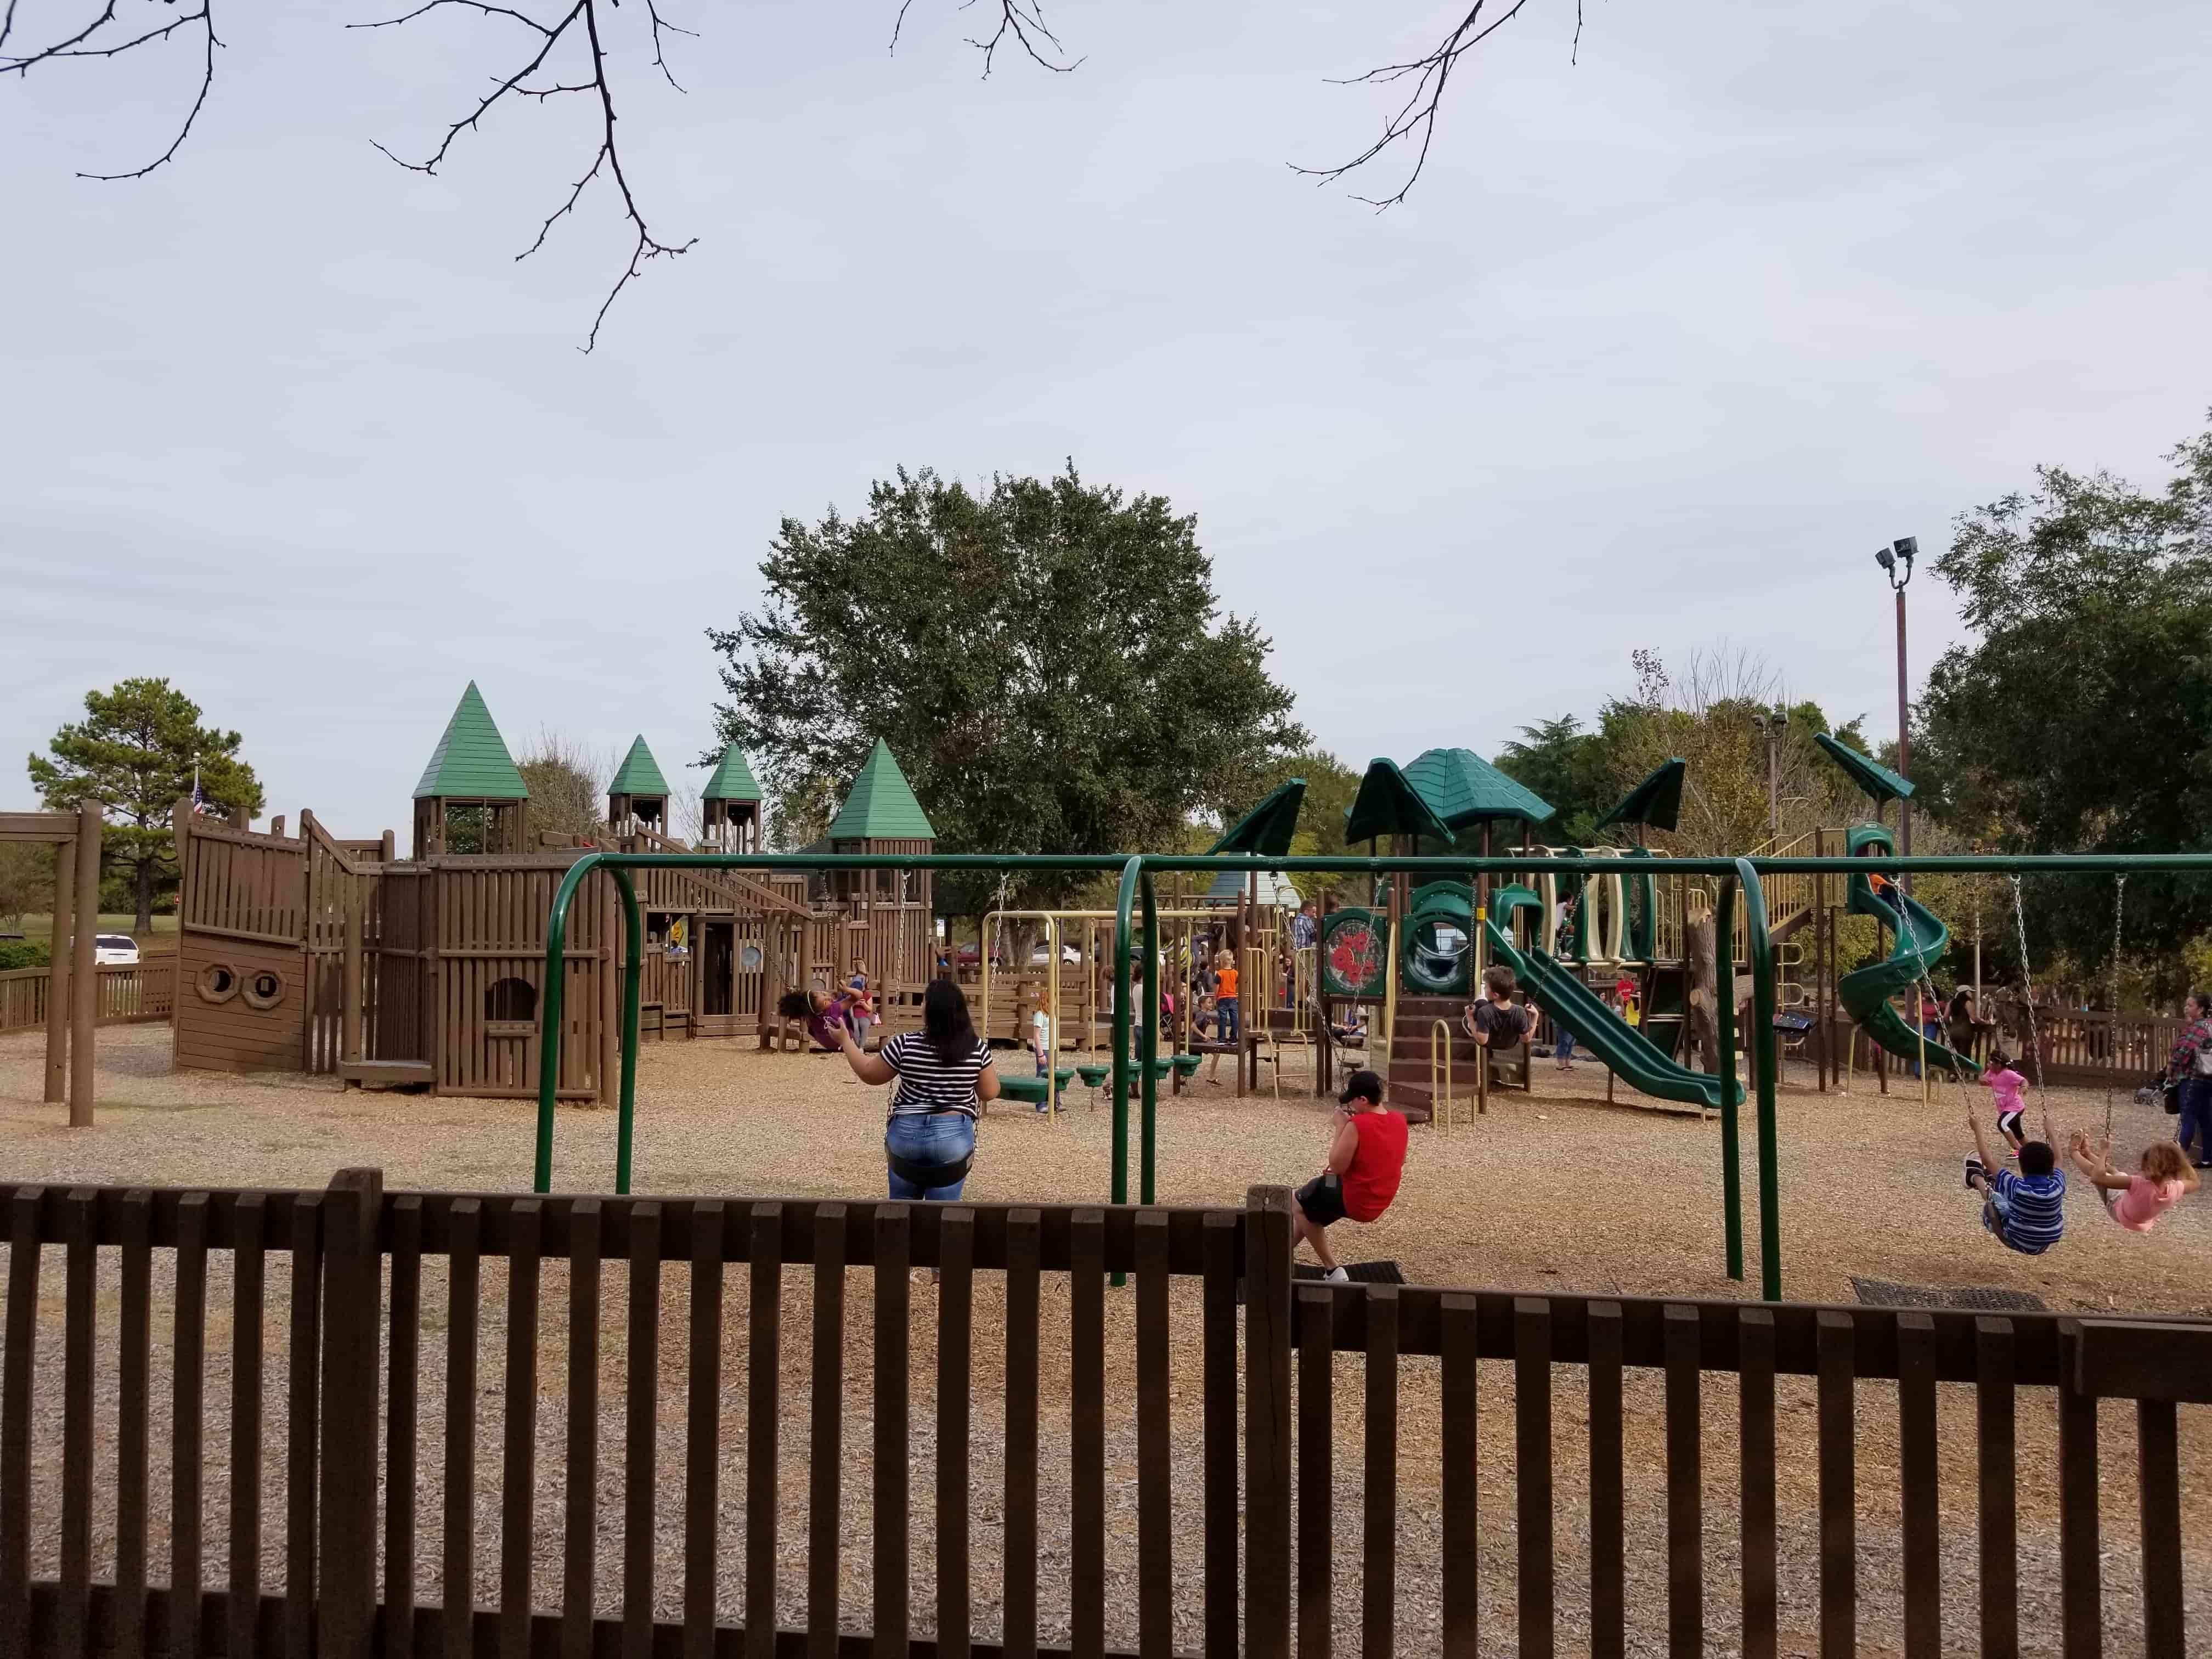 Chris Taylor Memorial Park Anderson, SC Review